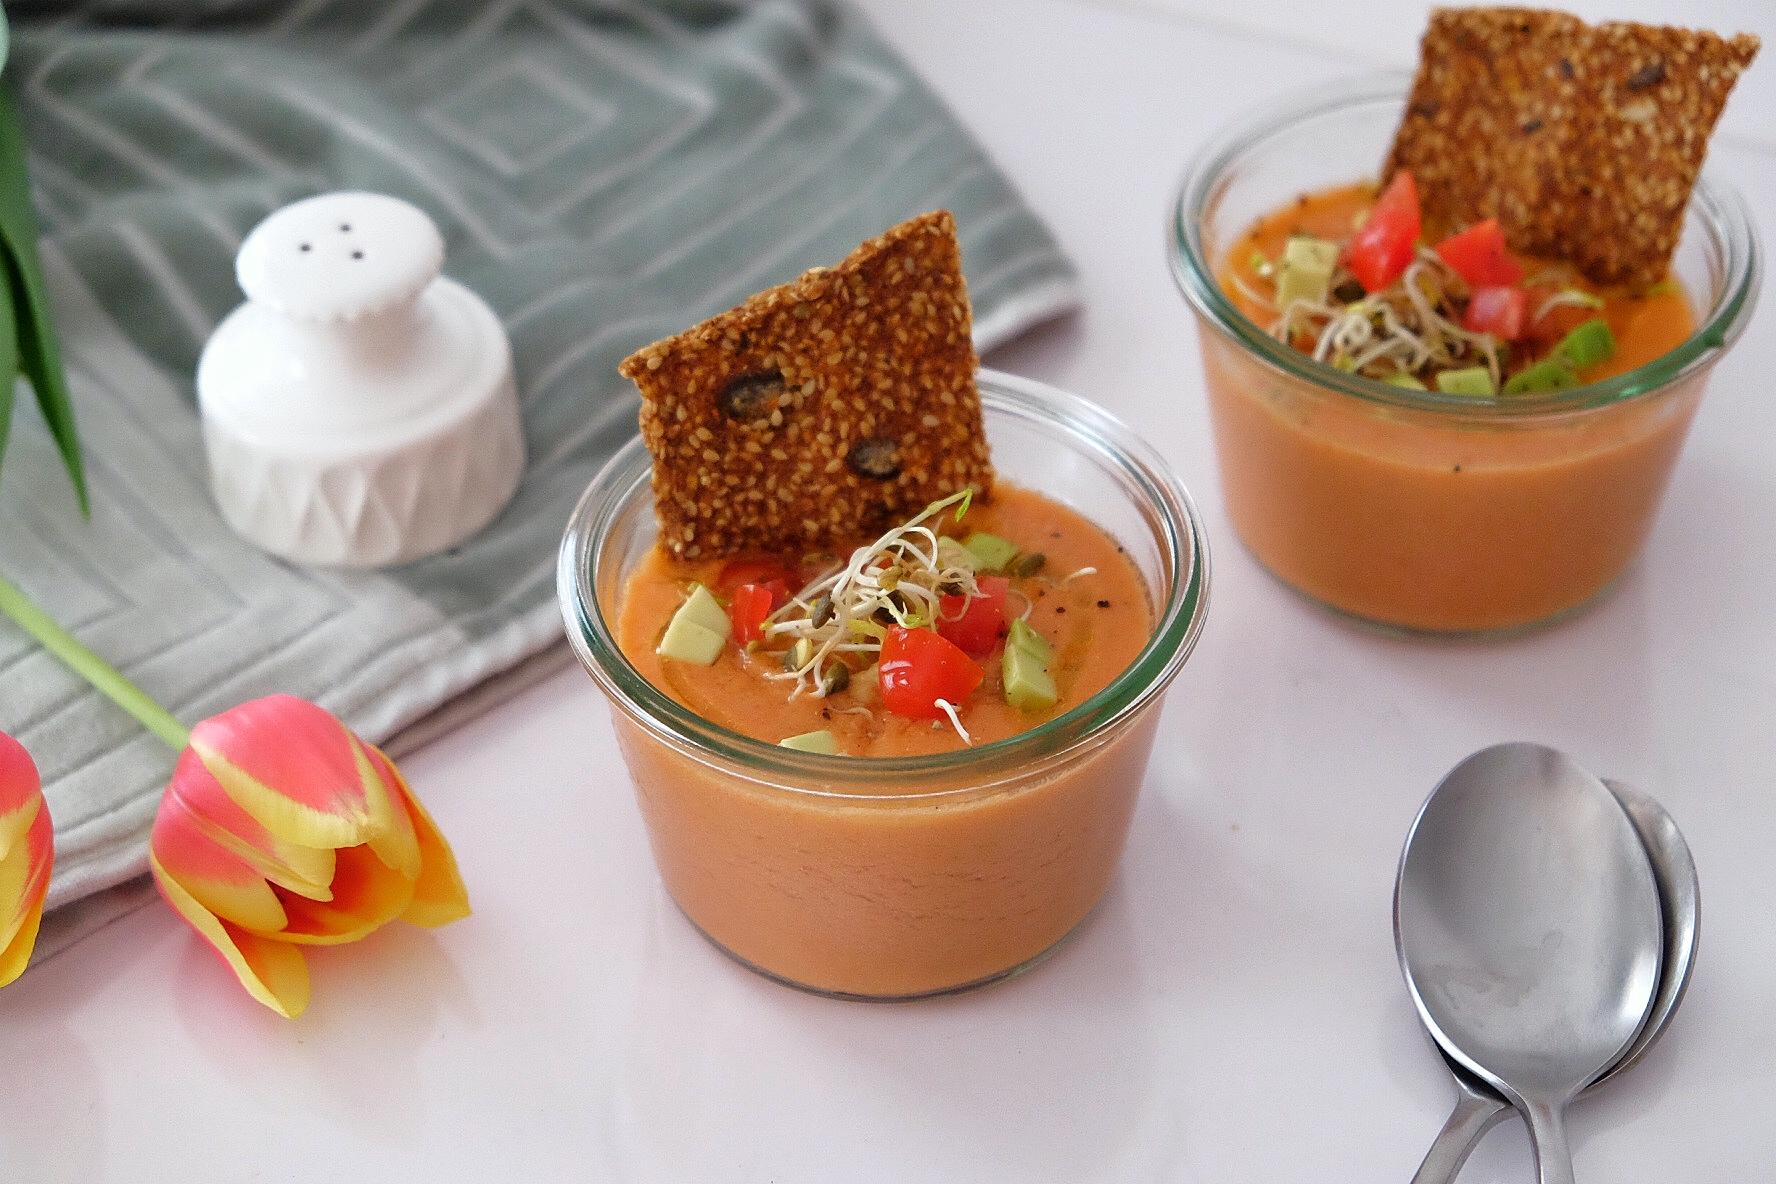 Super fresh gazpacho of watermelon and tomatoes